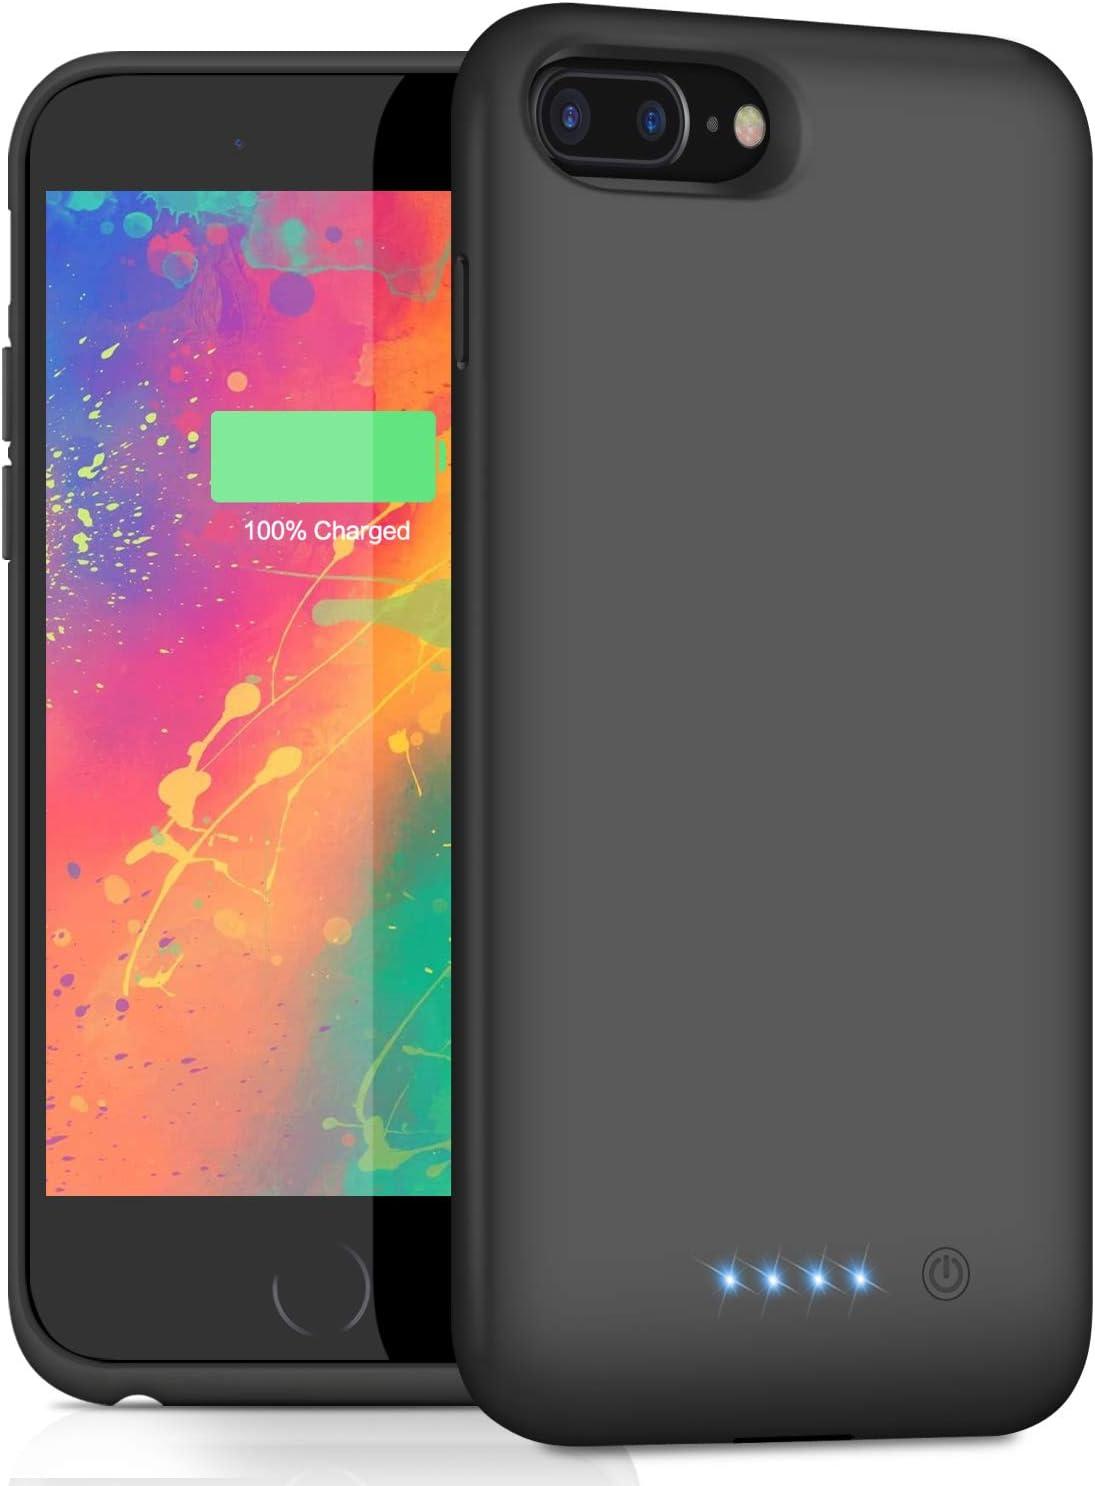 Amazon Com Battery Case For Iphone 8plus 7plus 6s Plus 6plus 8500mah Upgraded Portable Charging Case Rechargeable Battery Pack For Iphone 8plus 7plus Charger Case For Iphone 6splus 6plus 5 5 Inch Black